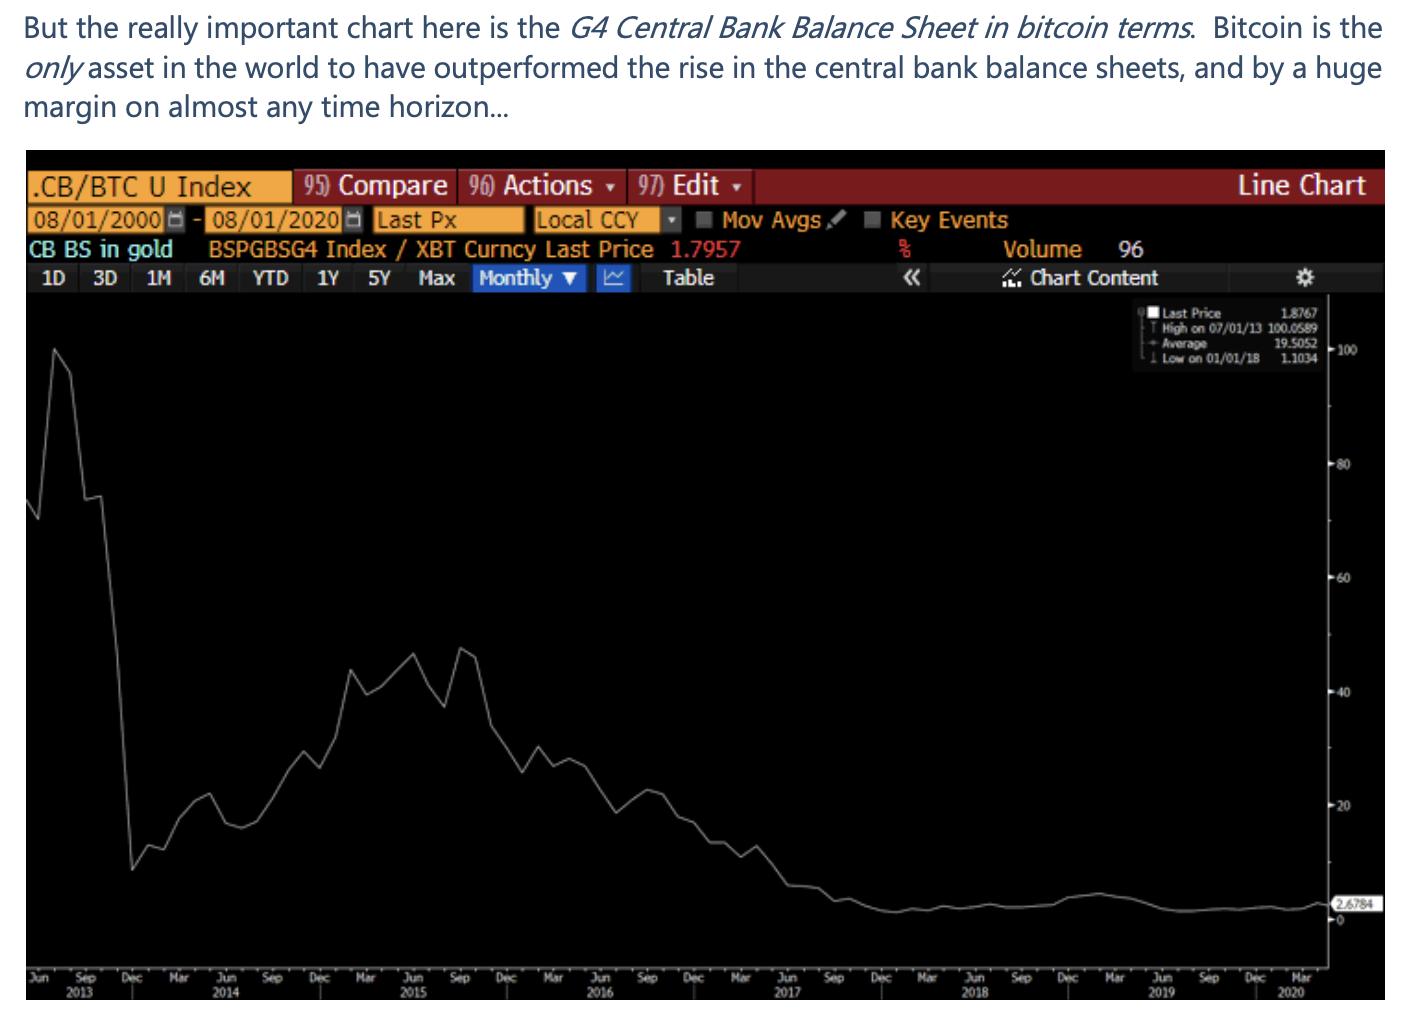 G4 central bank balance sheet in Bitcoin terms